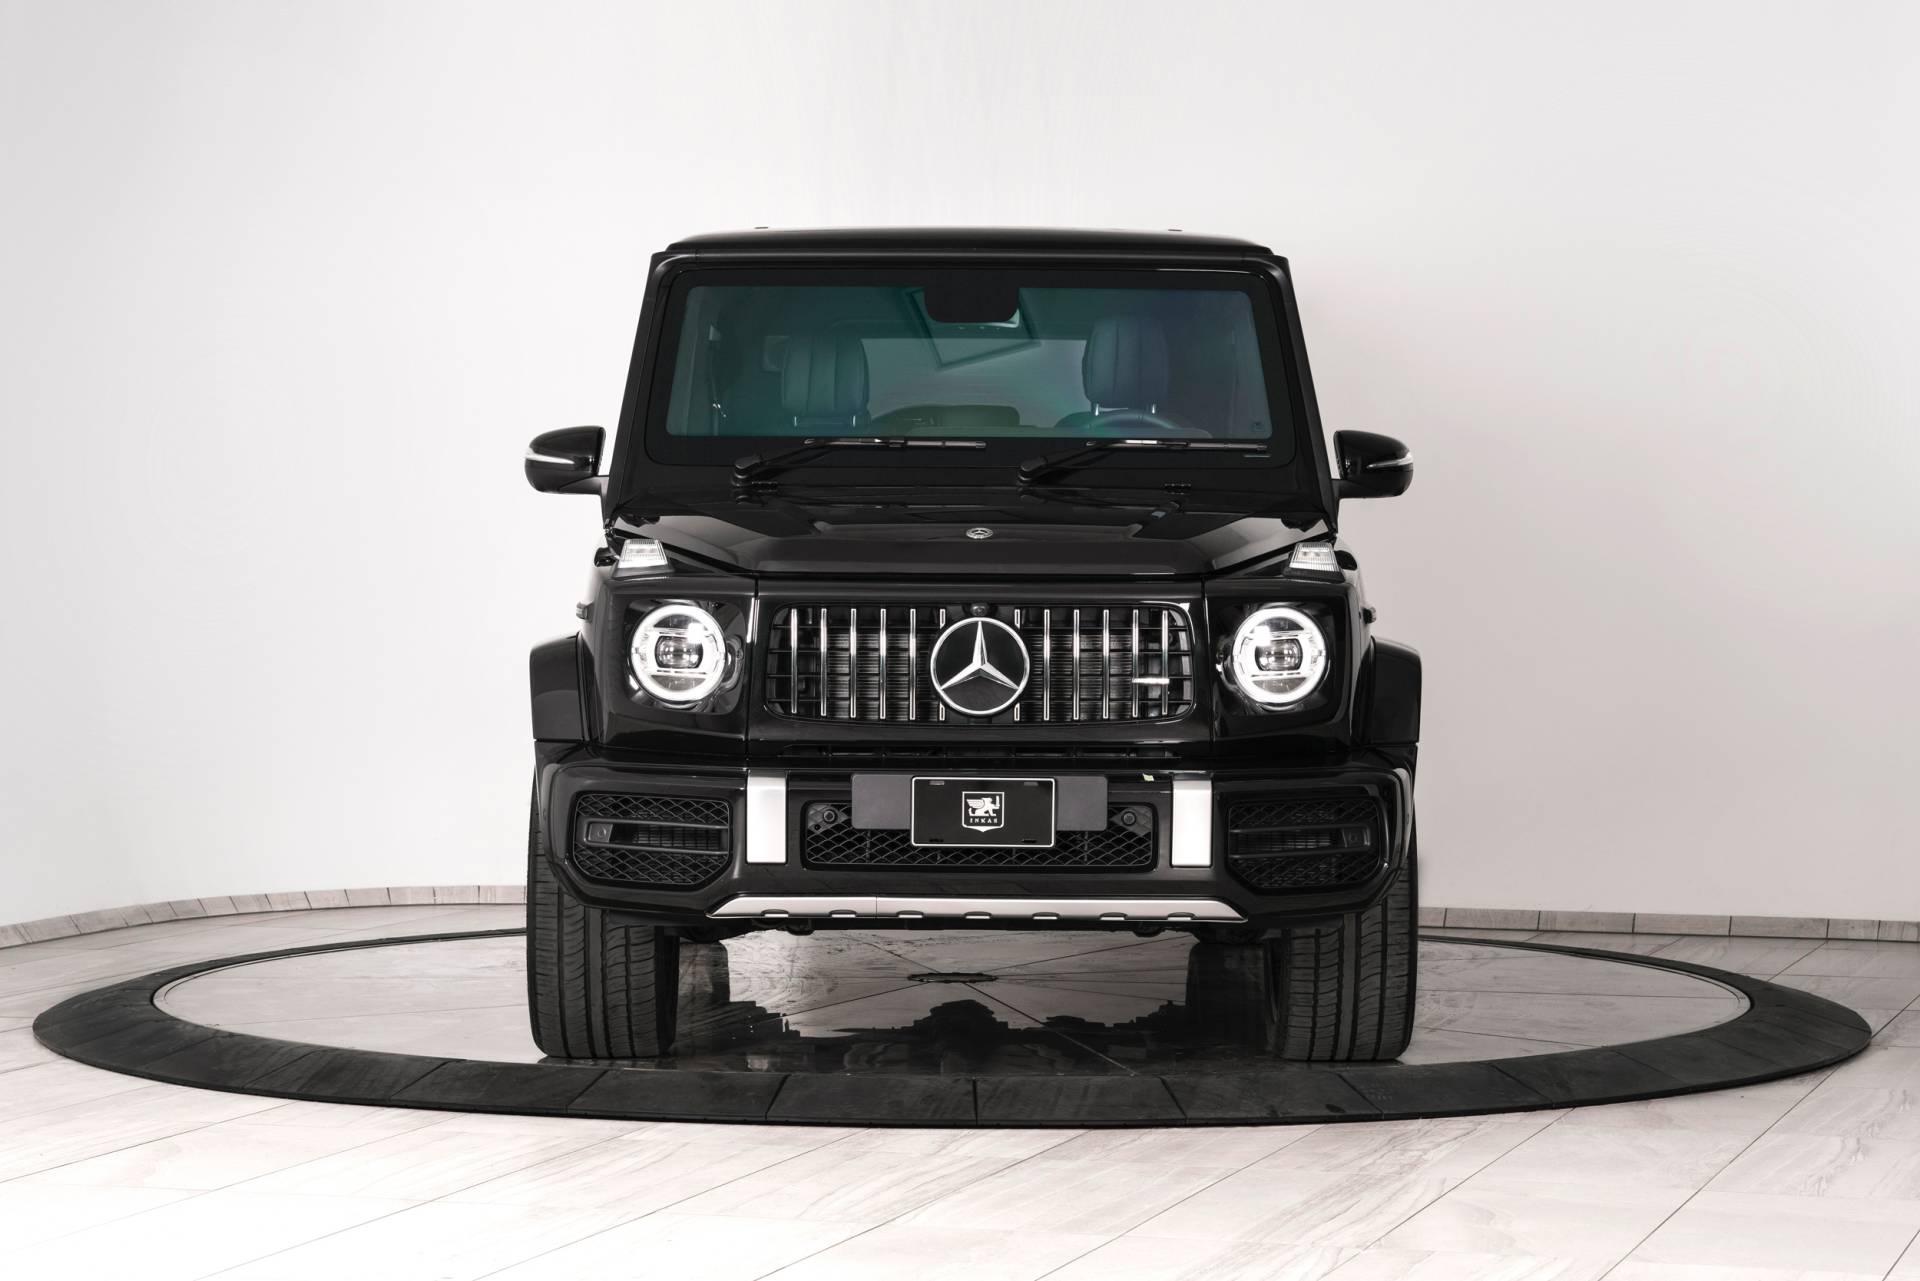 Mercedes G 63 AMG 2019 antiproiettile INKAS